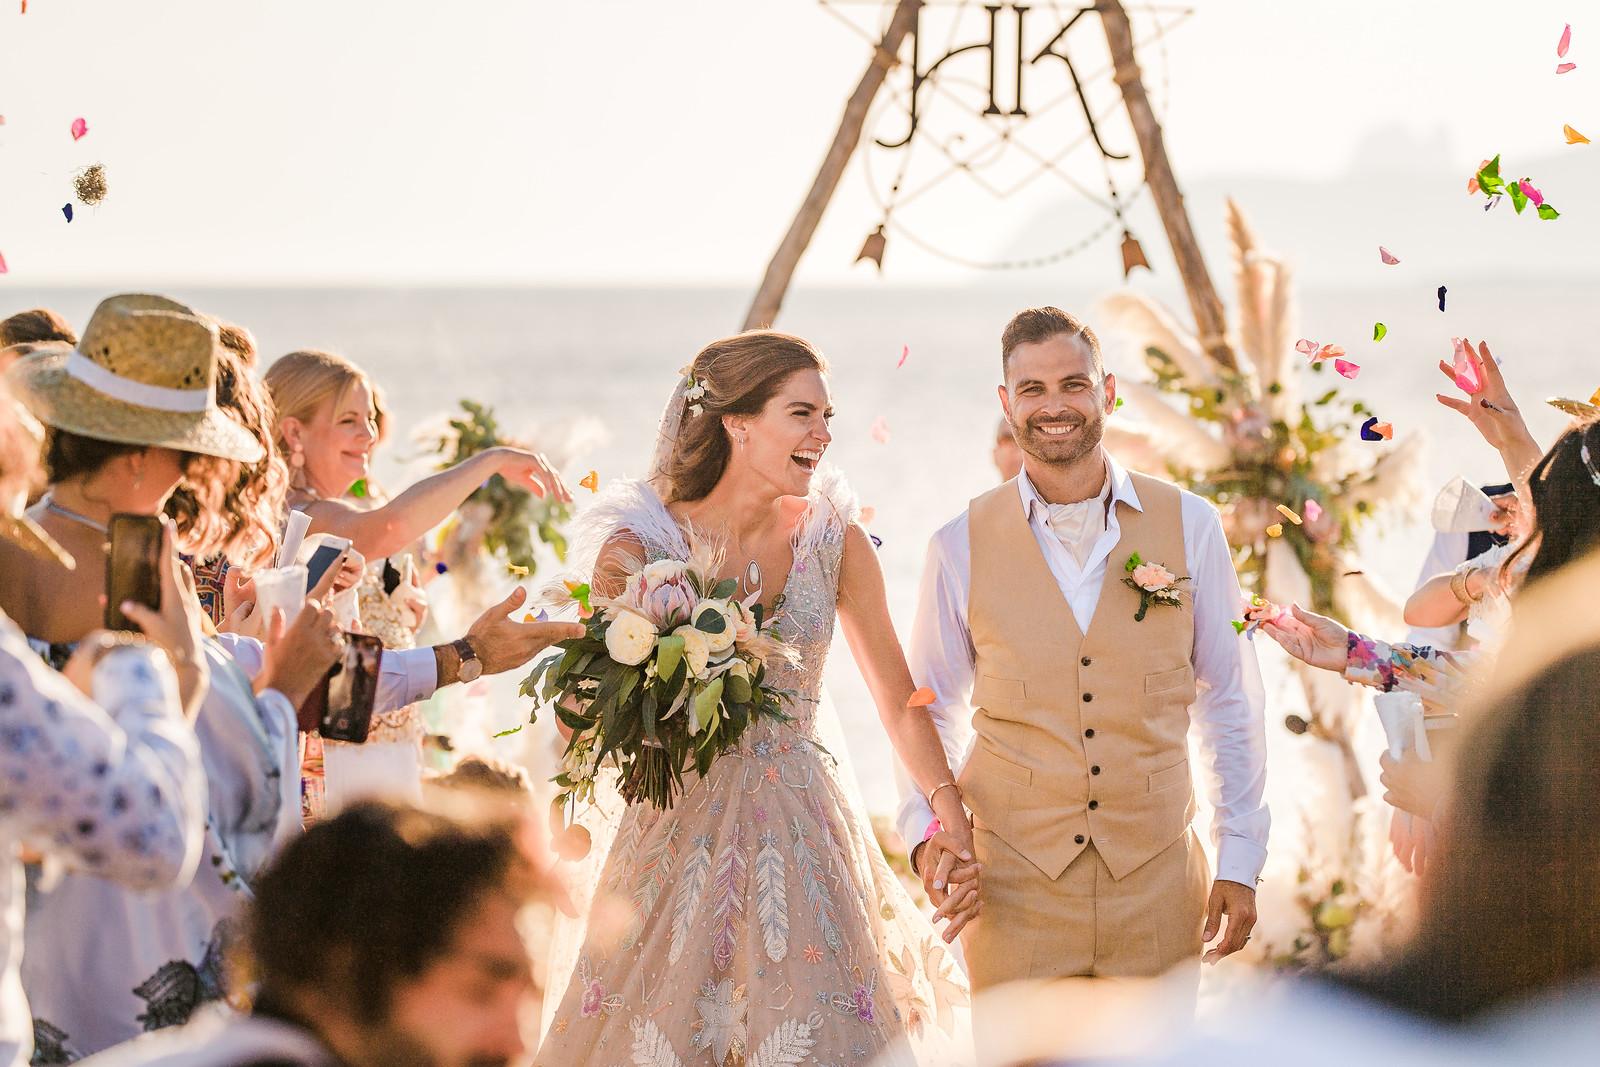 https://www.white-ibiza.com/wp-content/uploads/2020/03/white-ibiza-weddings-louise-maxwell-2020-01.jpg